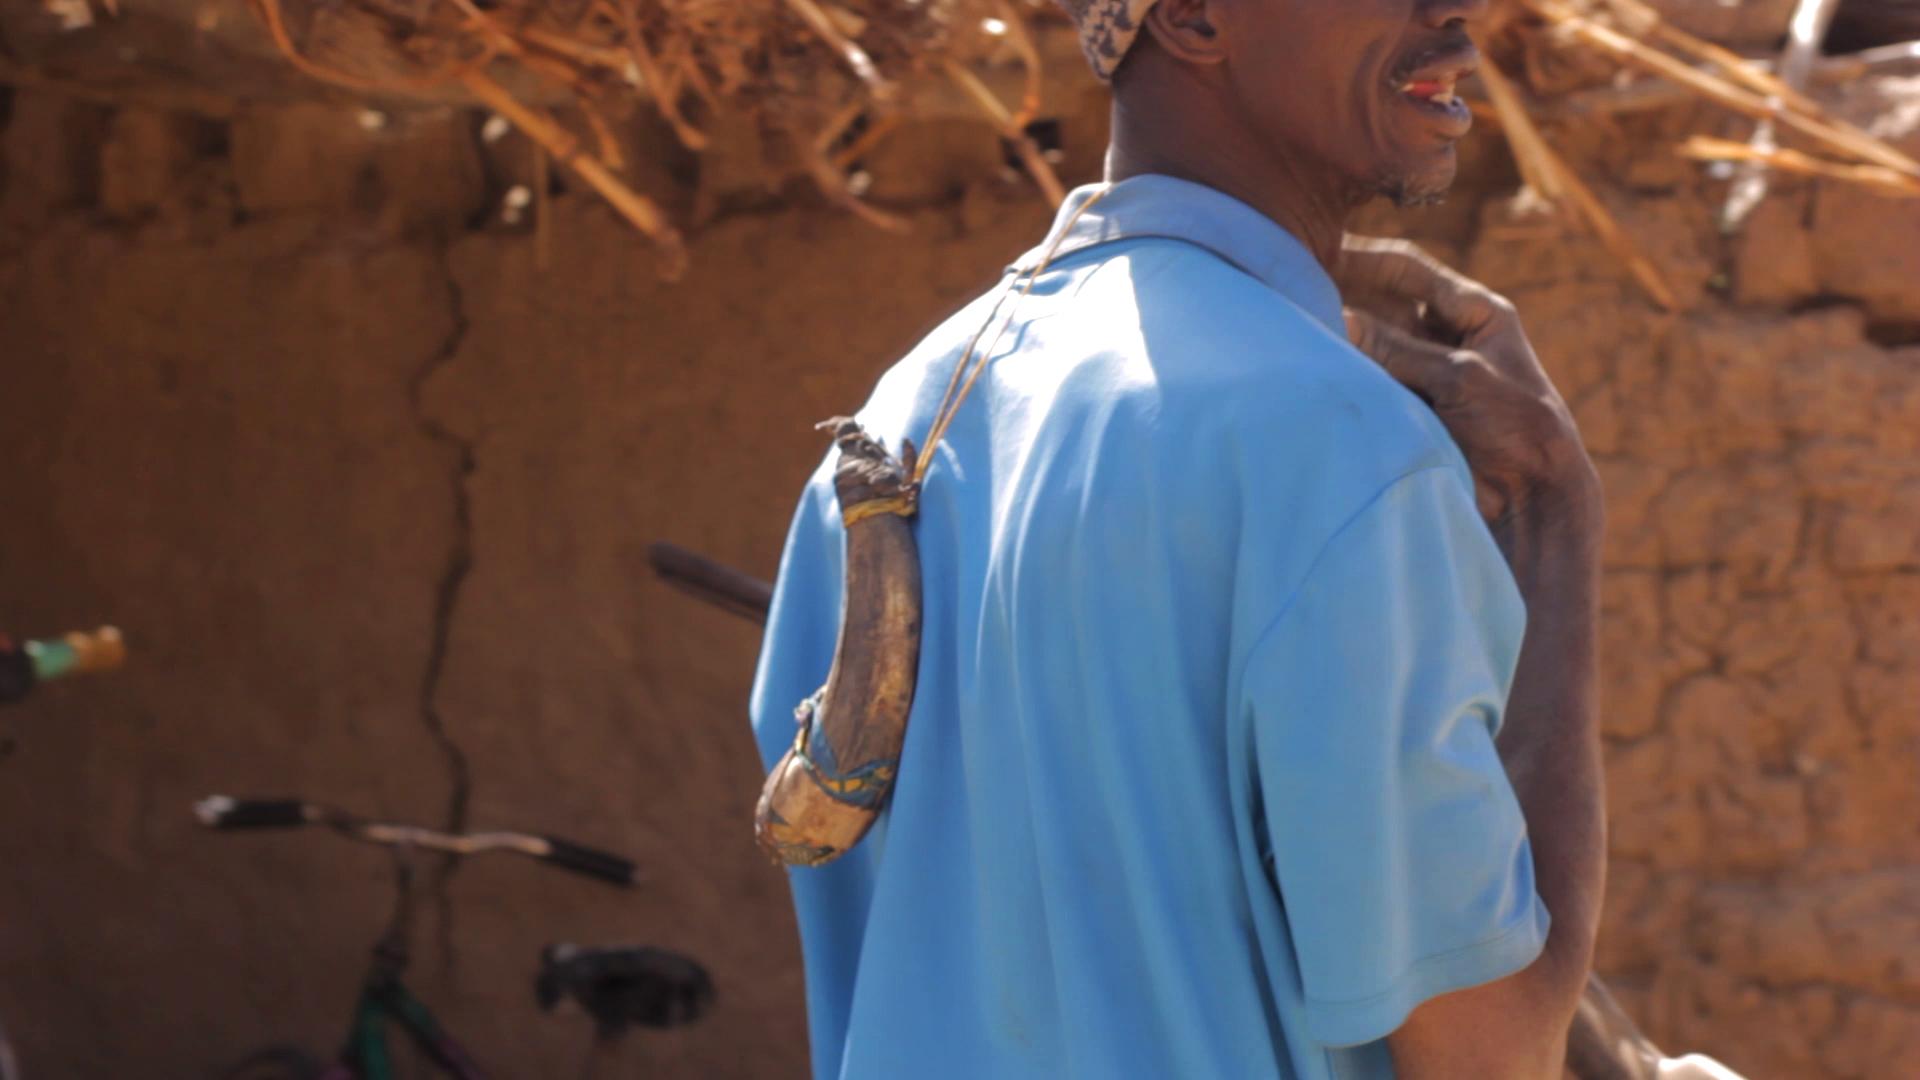 dogon pablocaminante herrero polvorin - Malí 8, País Dogon V: moda, arte y religión